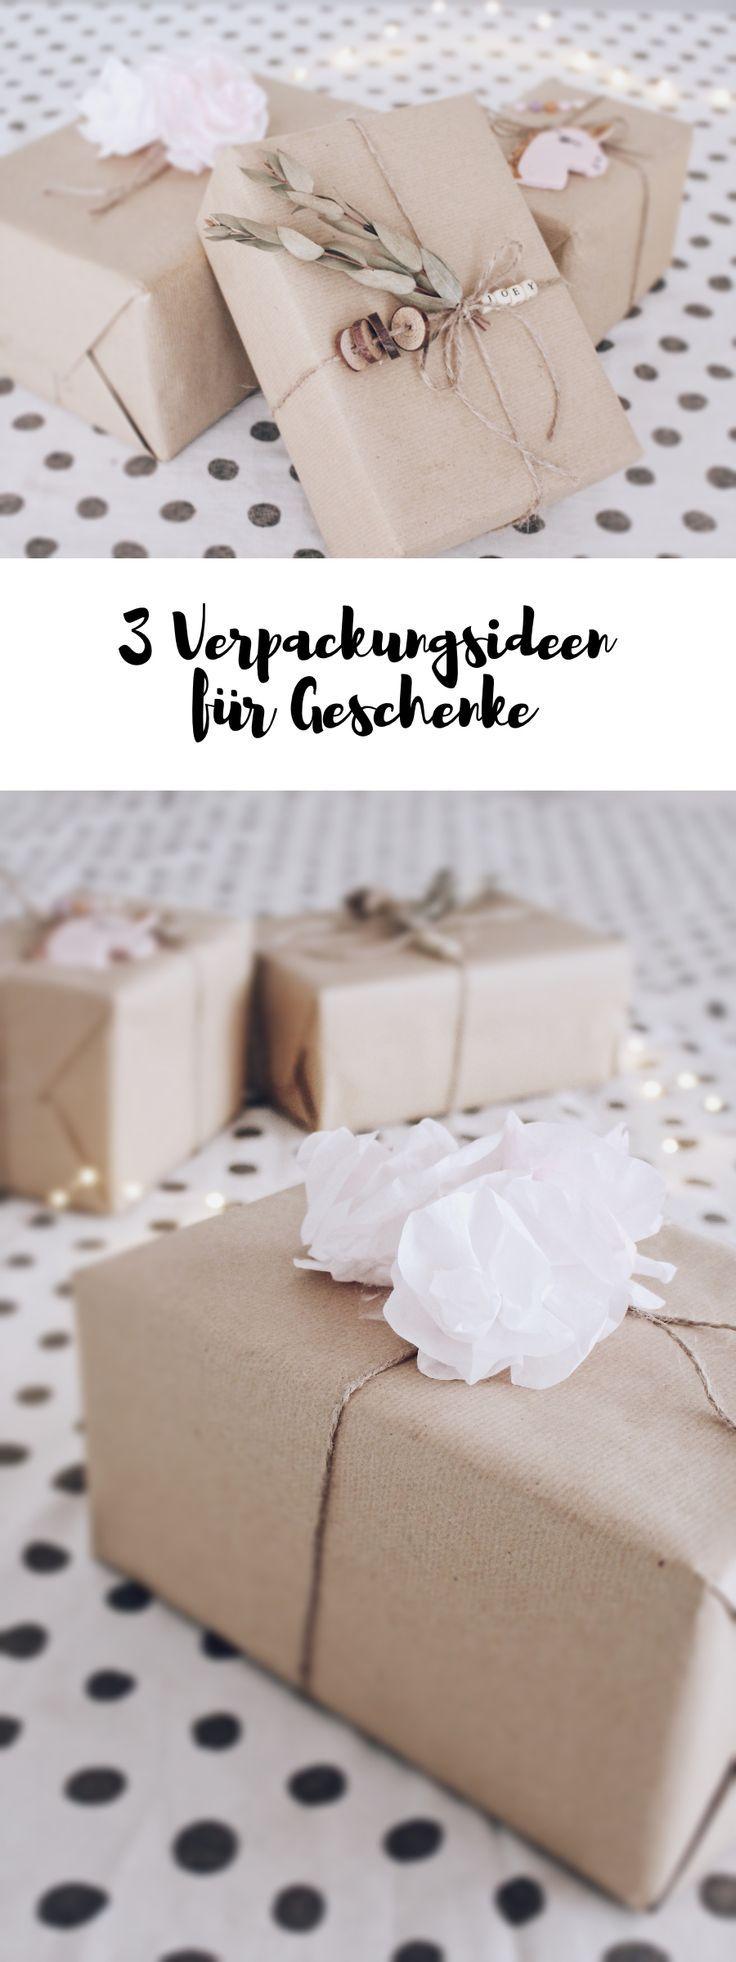 Diy Geschenke Verpacken 3 Kreative Ideen Um Geschenke Zu Verpacken